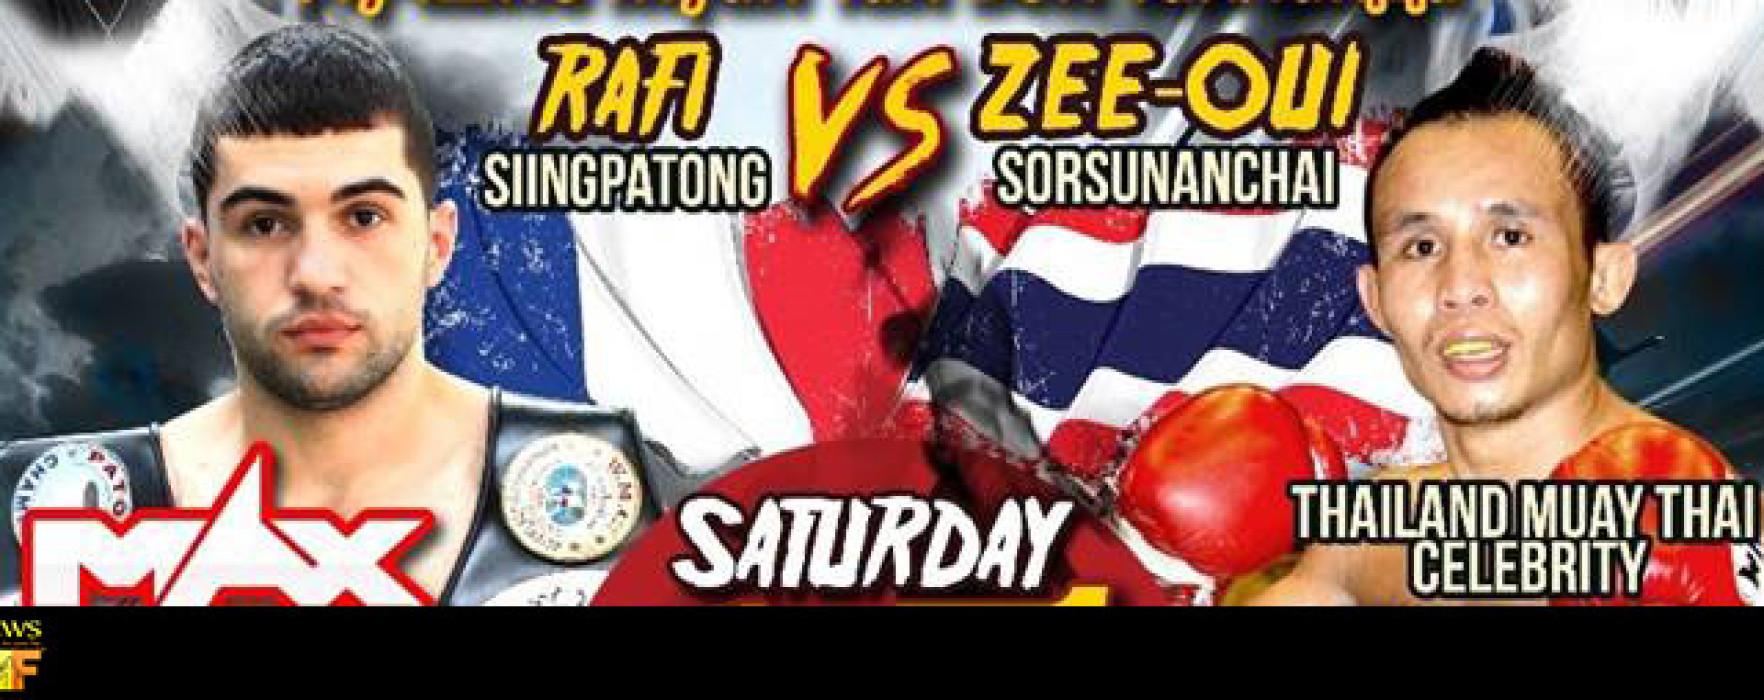 Seeoui Sor Sunantachai vs Rafi Singpatong – Patong Boxing Stadium – 15th November 2014